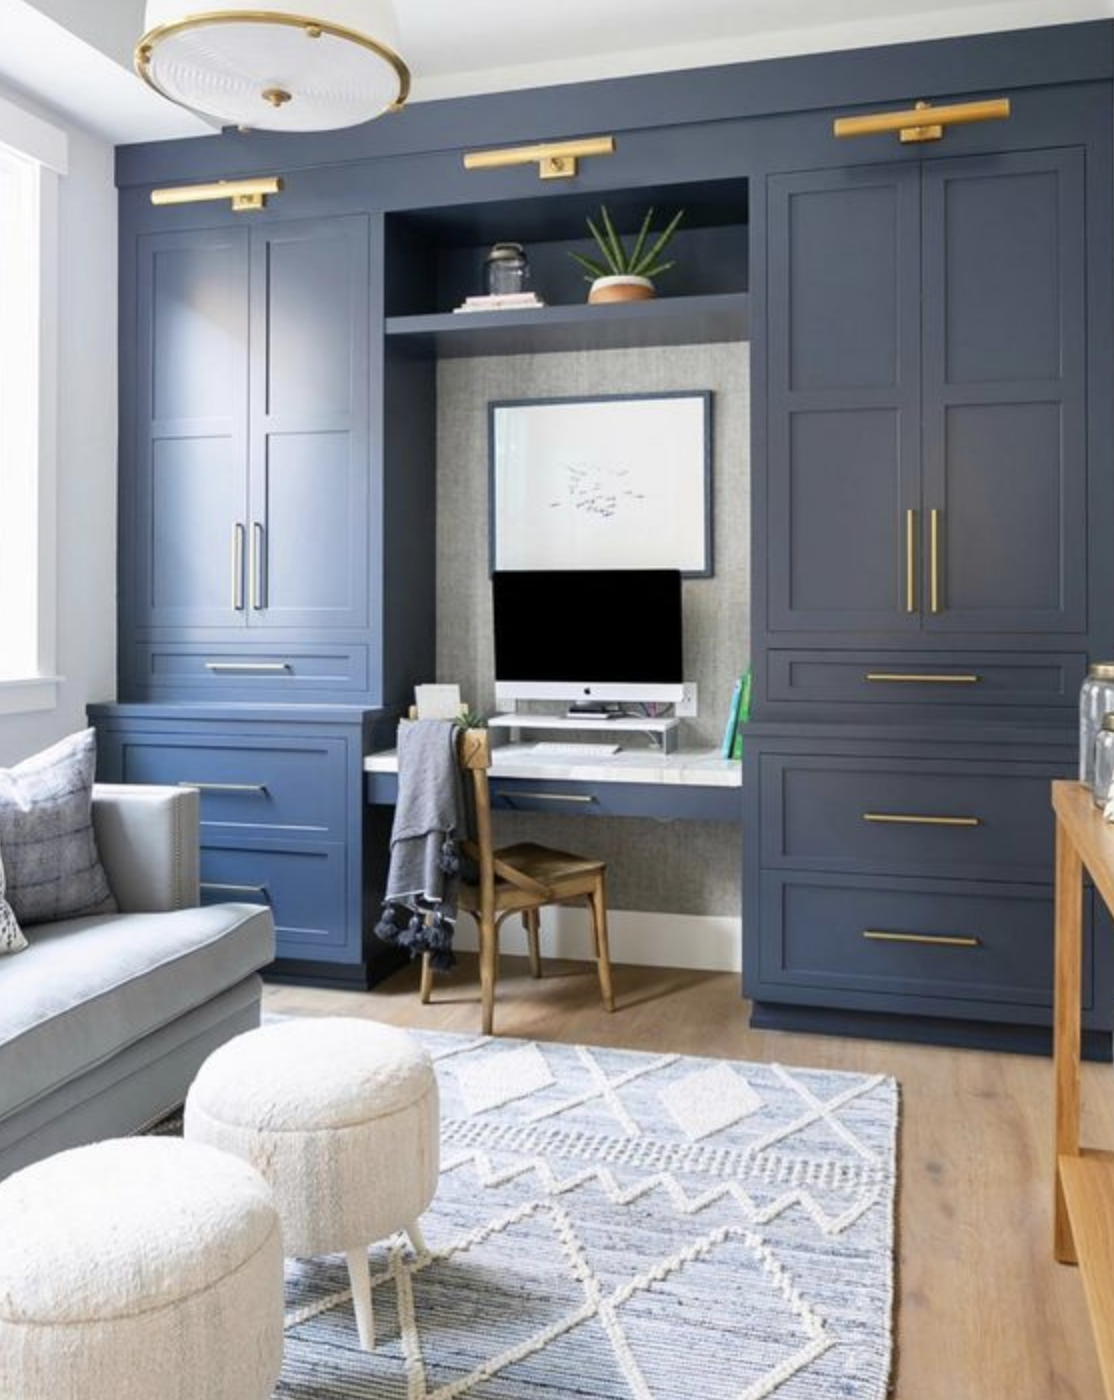 built in cabinets desk drawers lighting cobalt blue buckhead